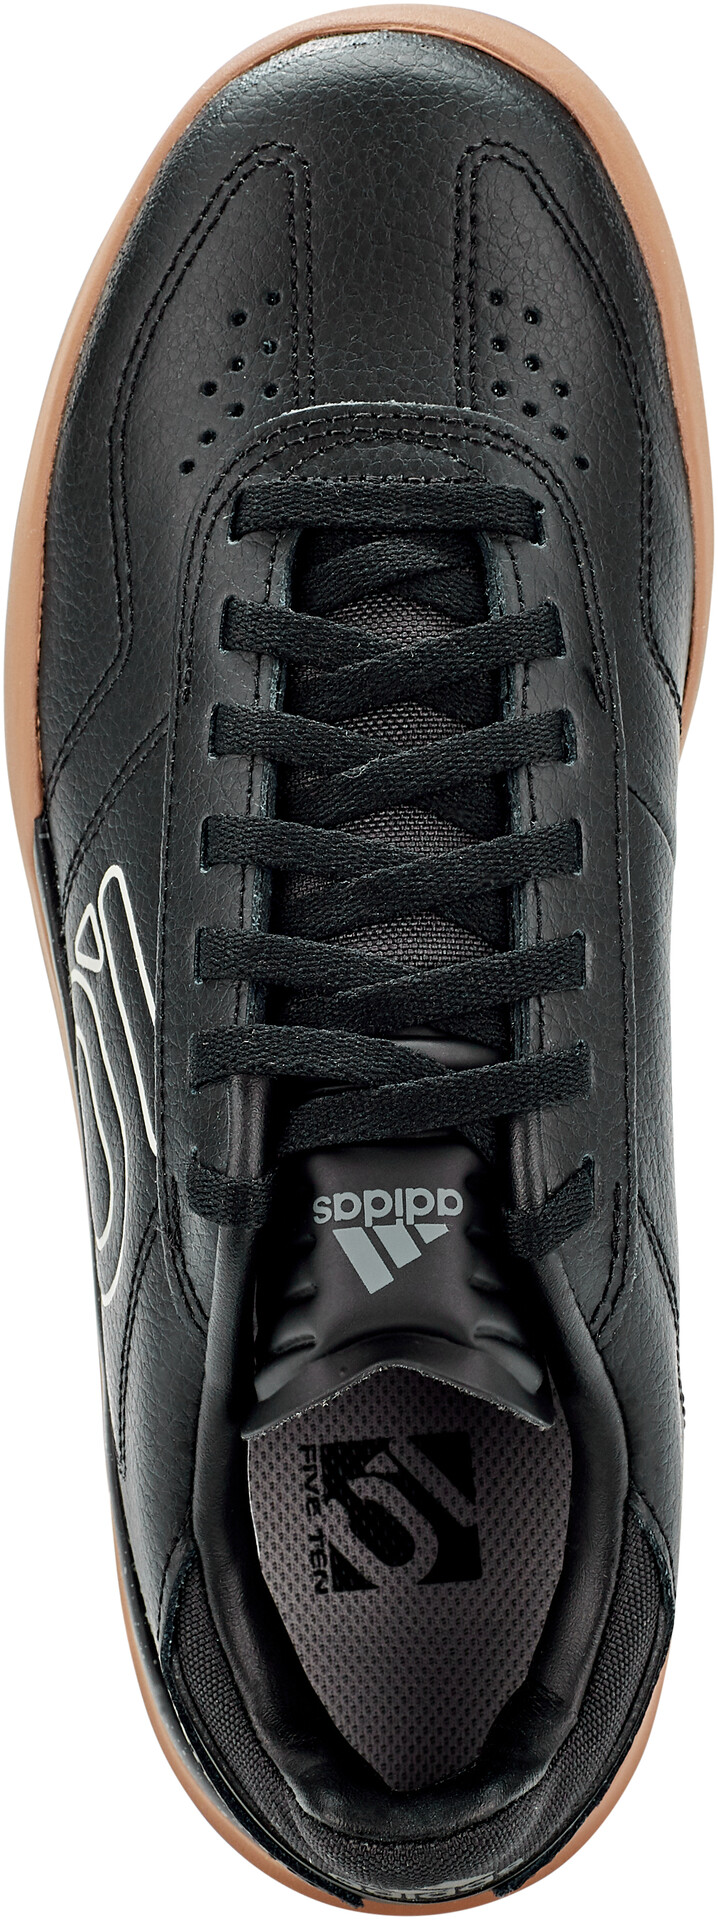 scarpe adidas mtb donna